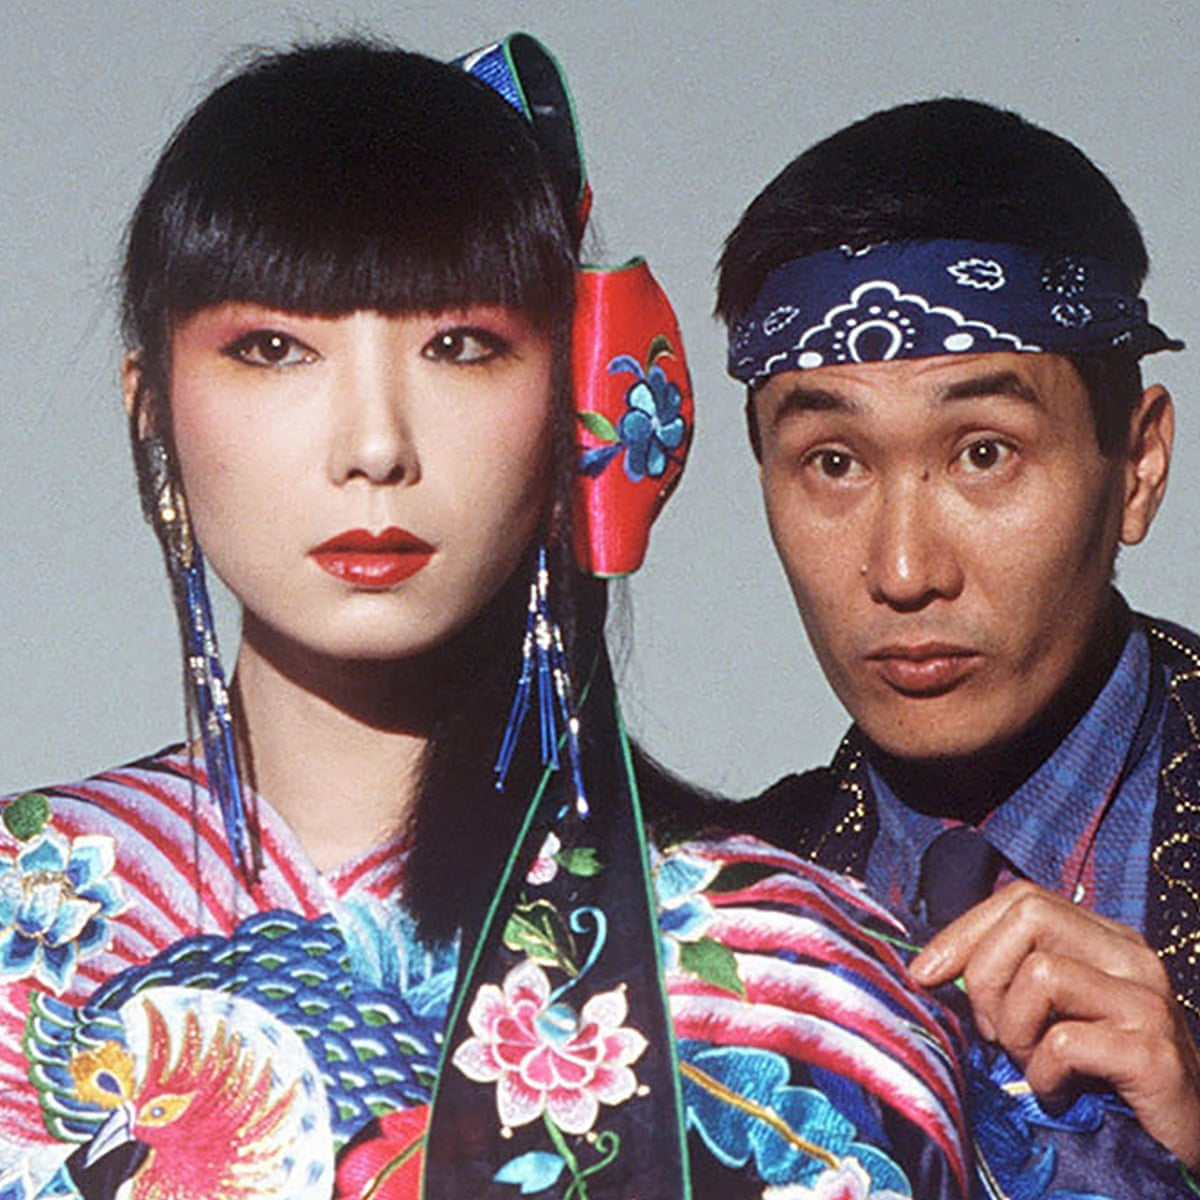 Designer And David Bowie Collaborator Kansai Yamamoto Dies Aged 76 Fashion The Guardian